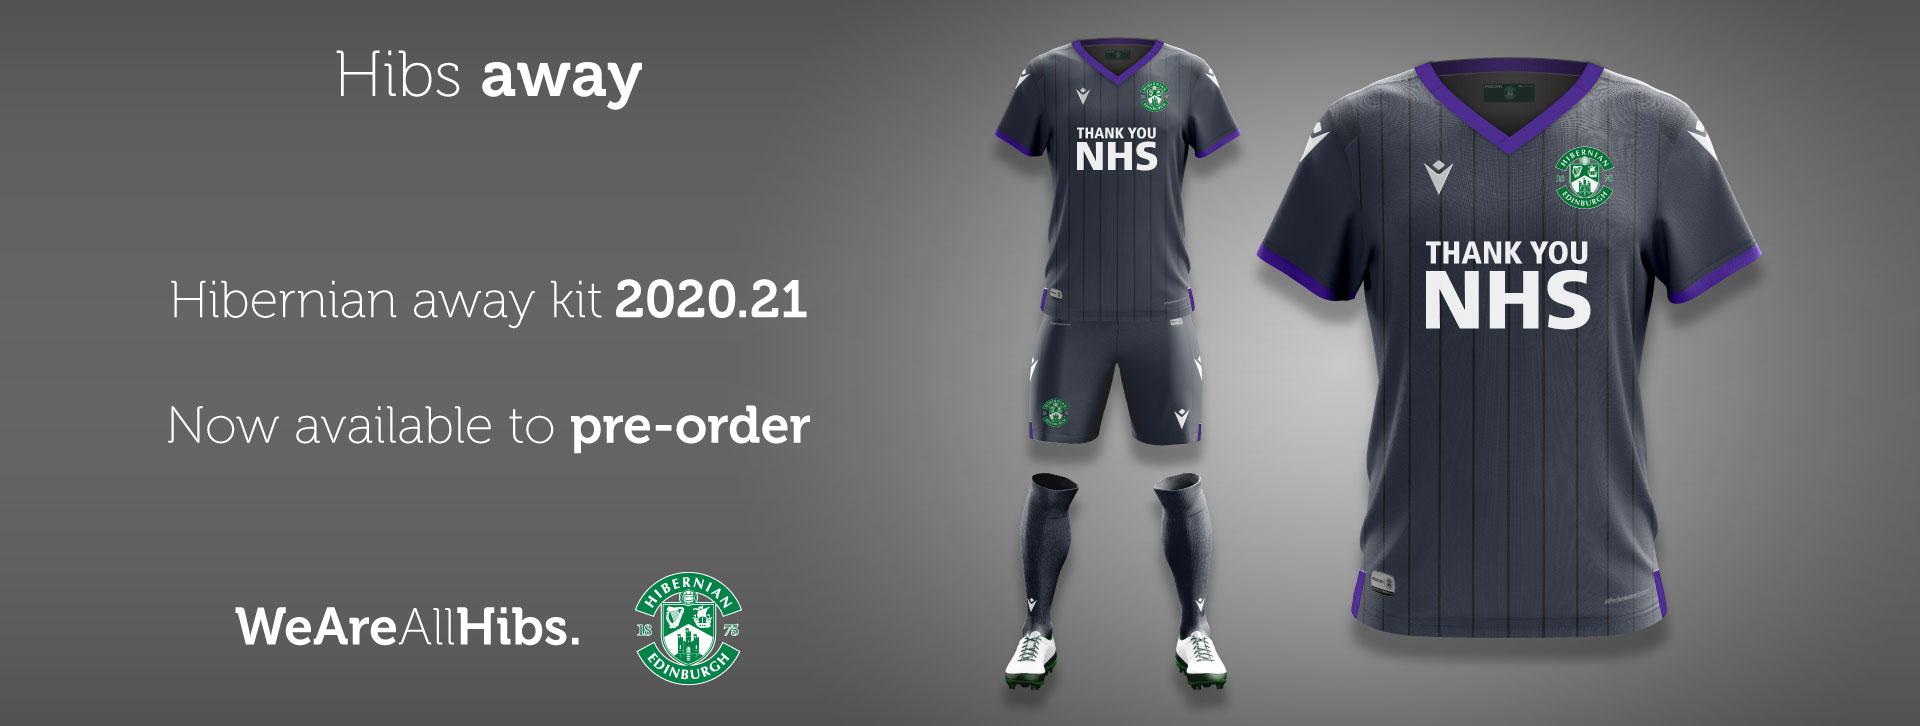 Hibernian FC 2020/21 Away Kit - Pre-Order